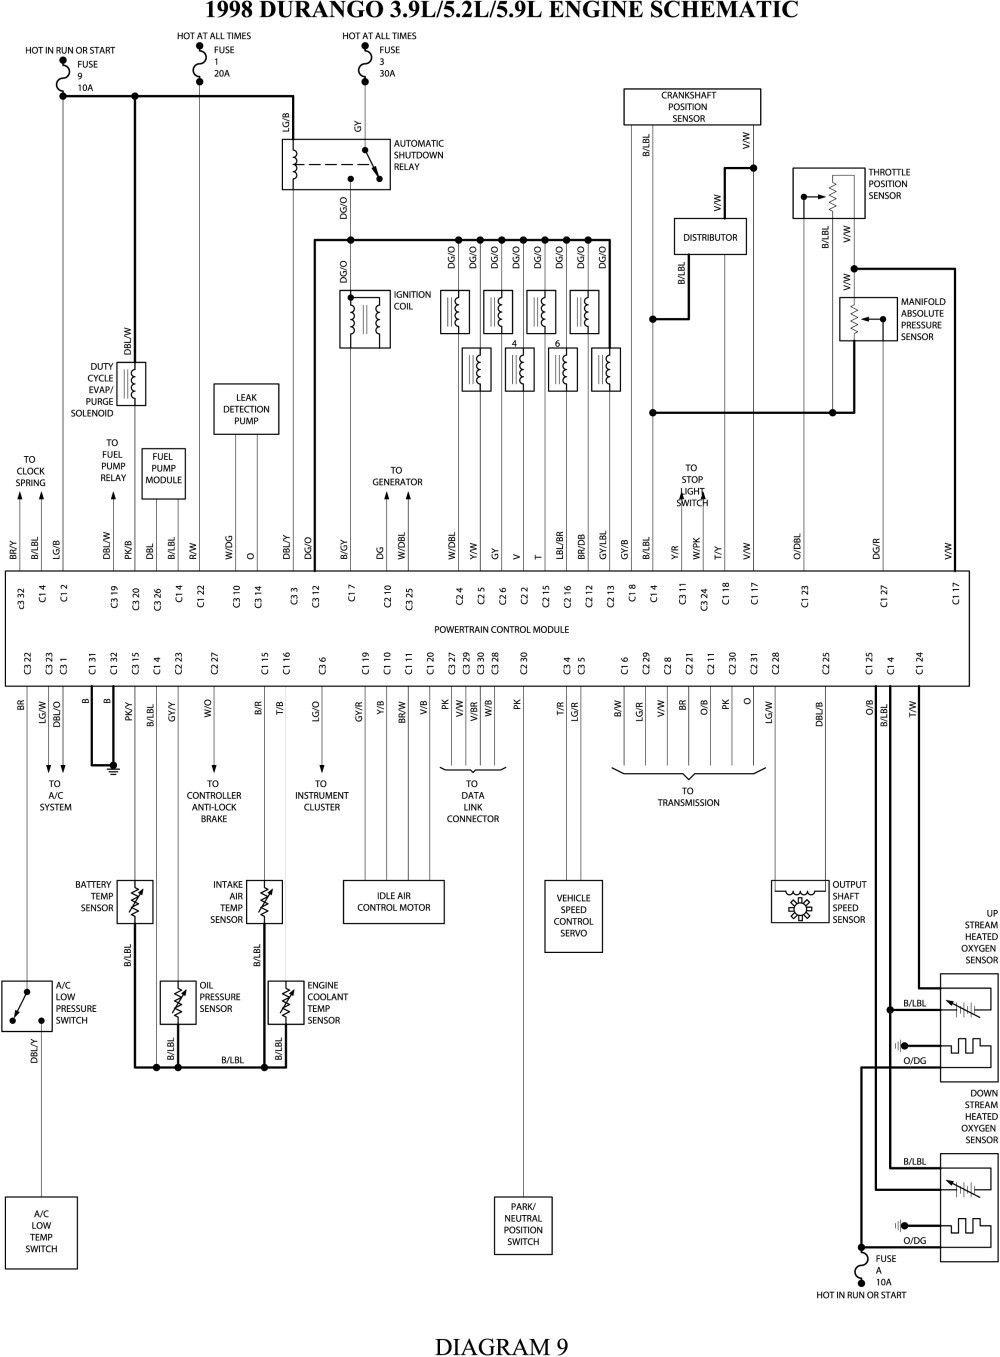 1999 Dodge Durango Wiring Diagram New in 2020 | Dodge ...